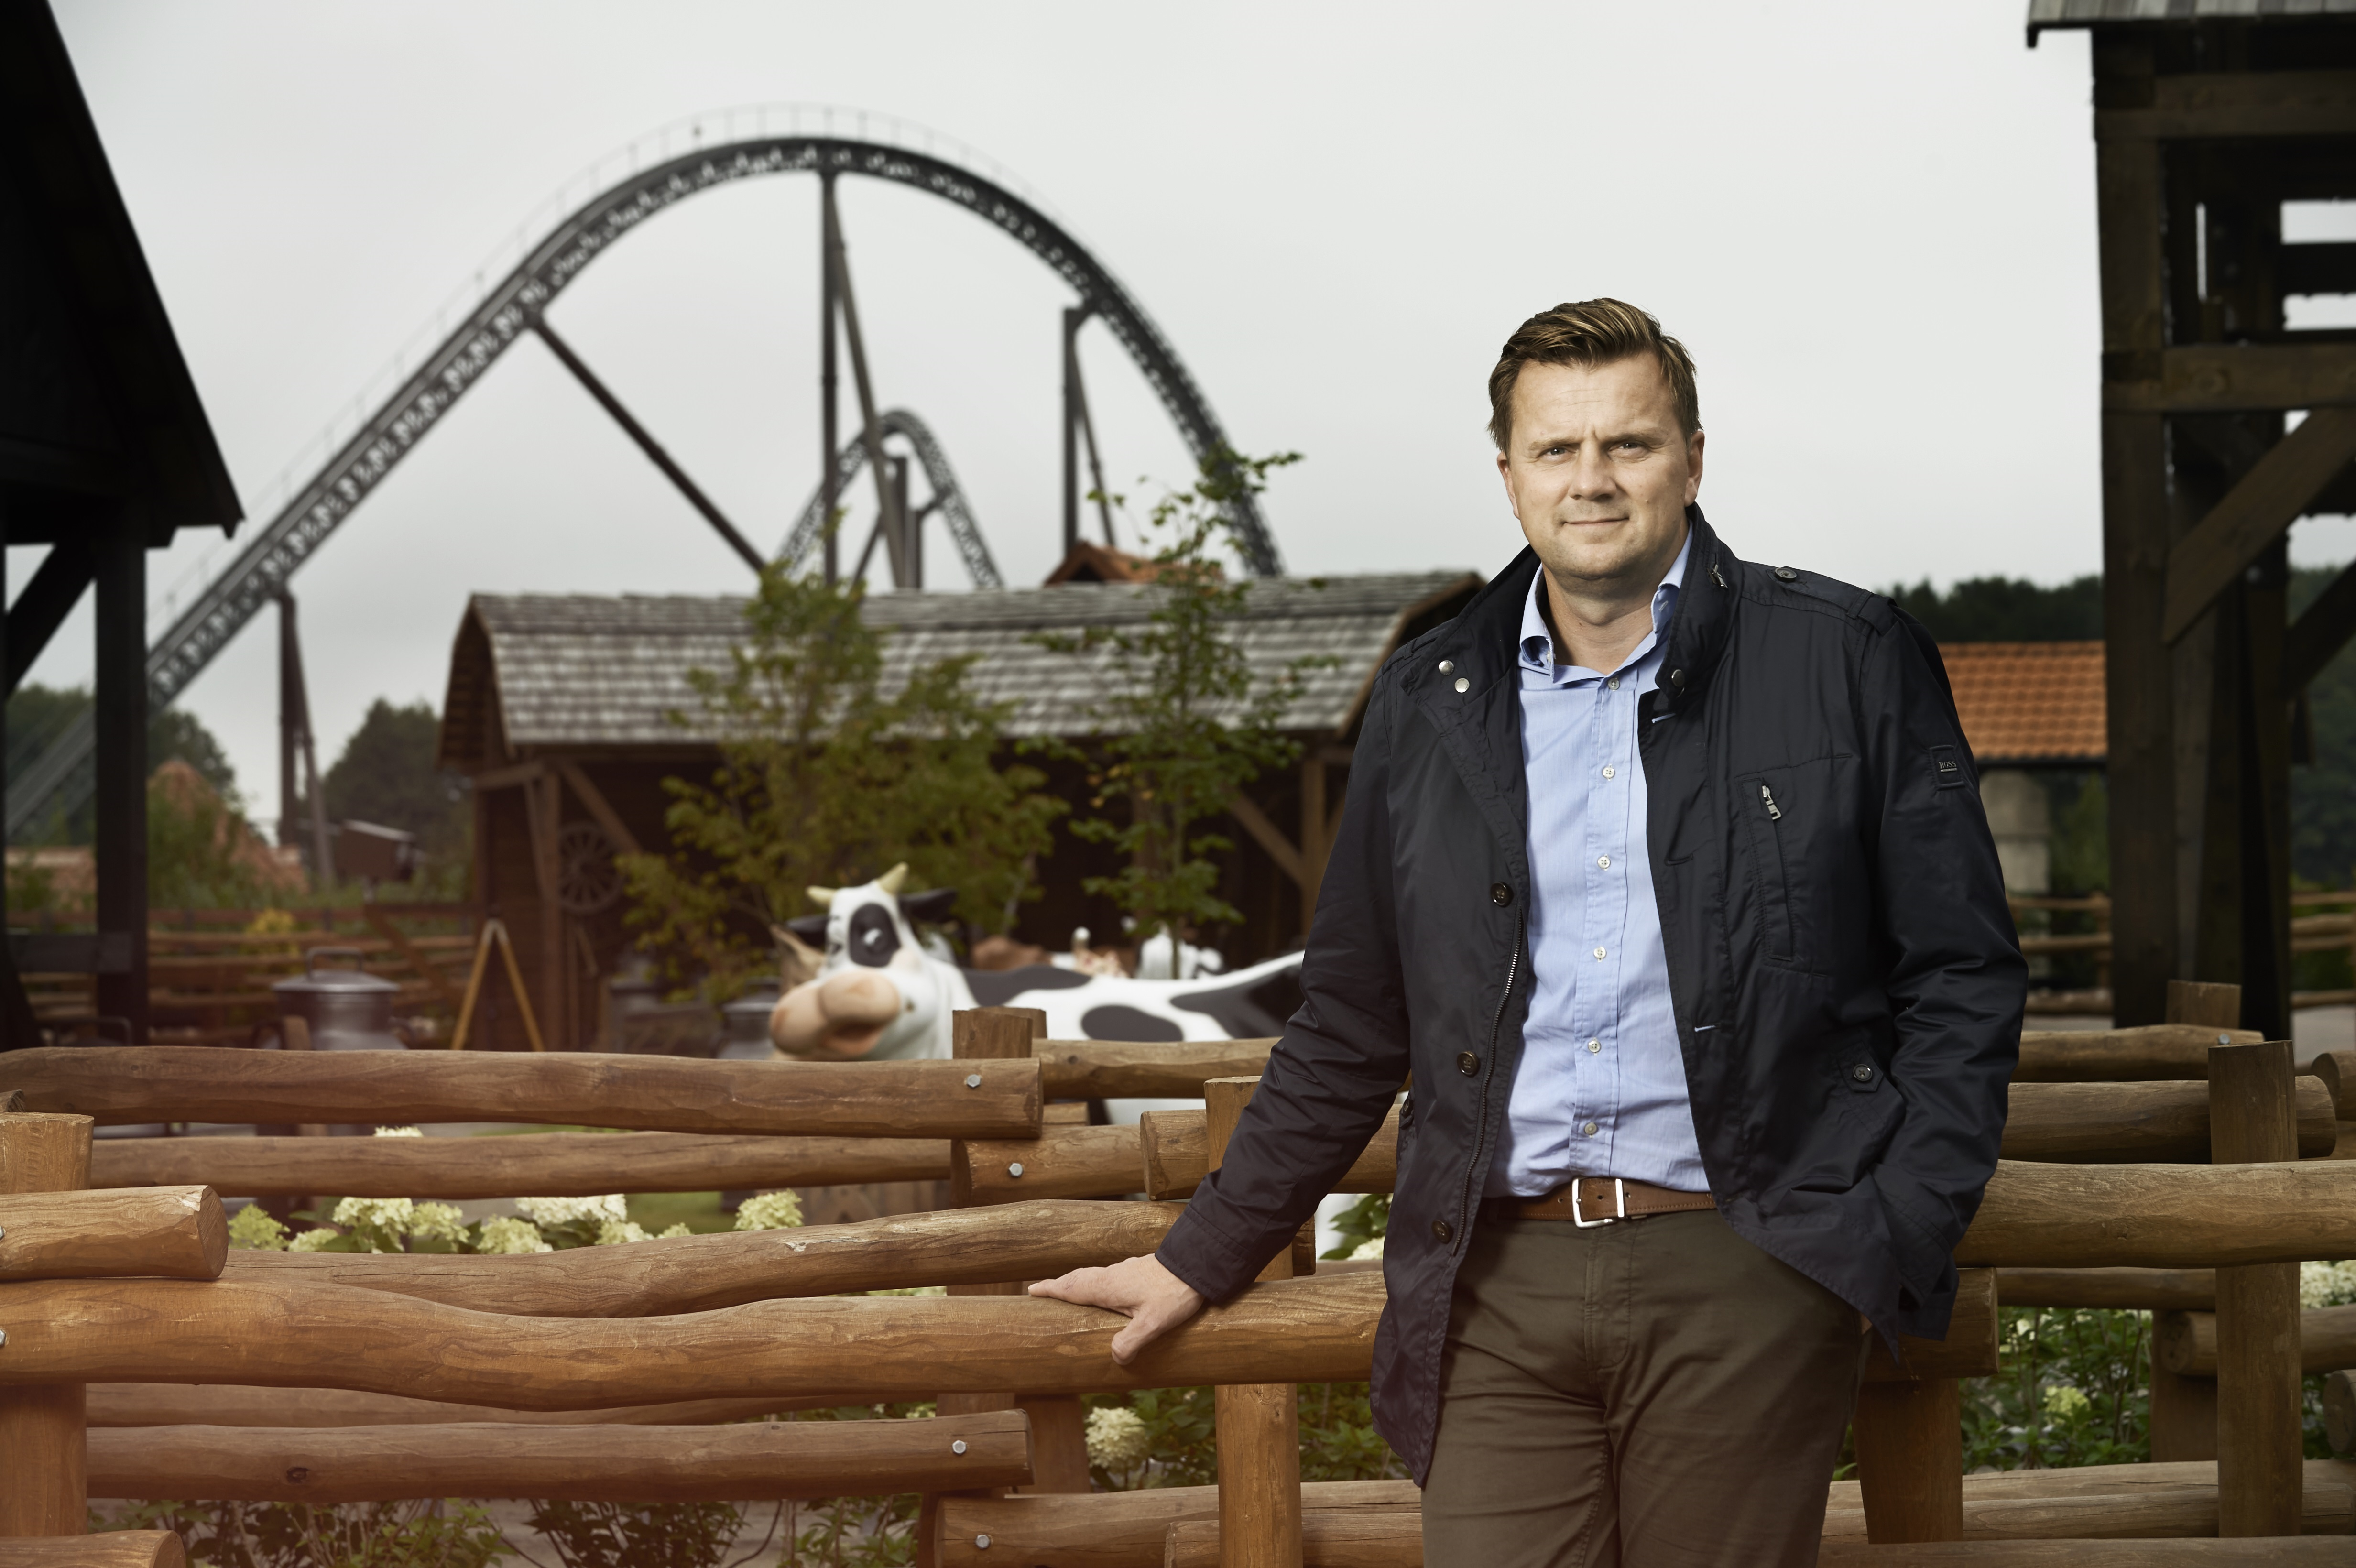 Michael B. Nielsen, Director and Owner of Djurs Sommerland